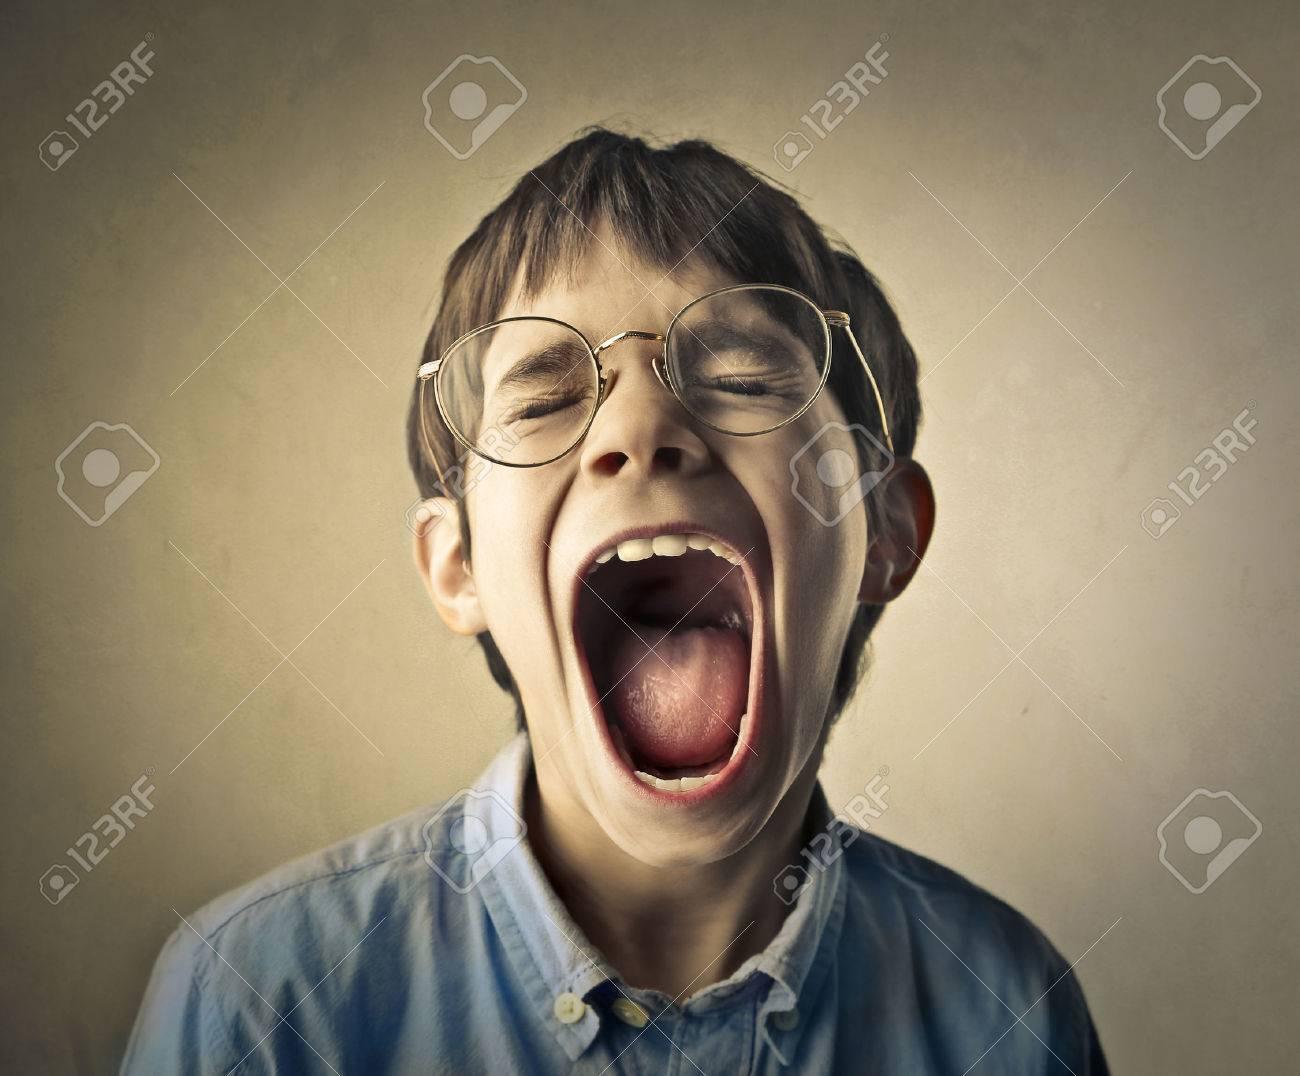 36234362-child-screaming